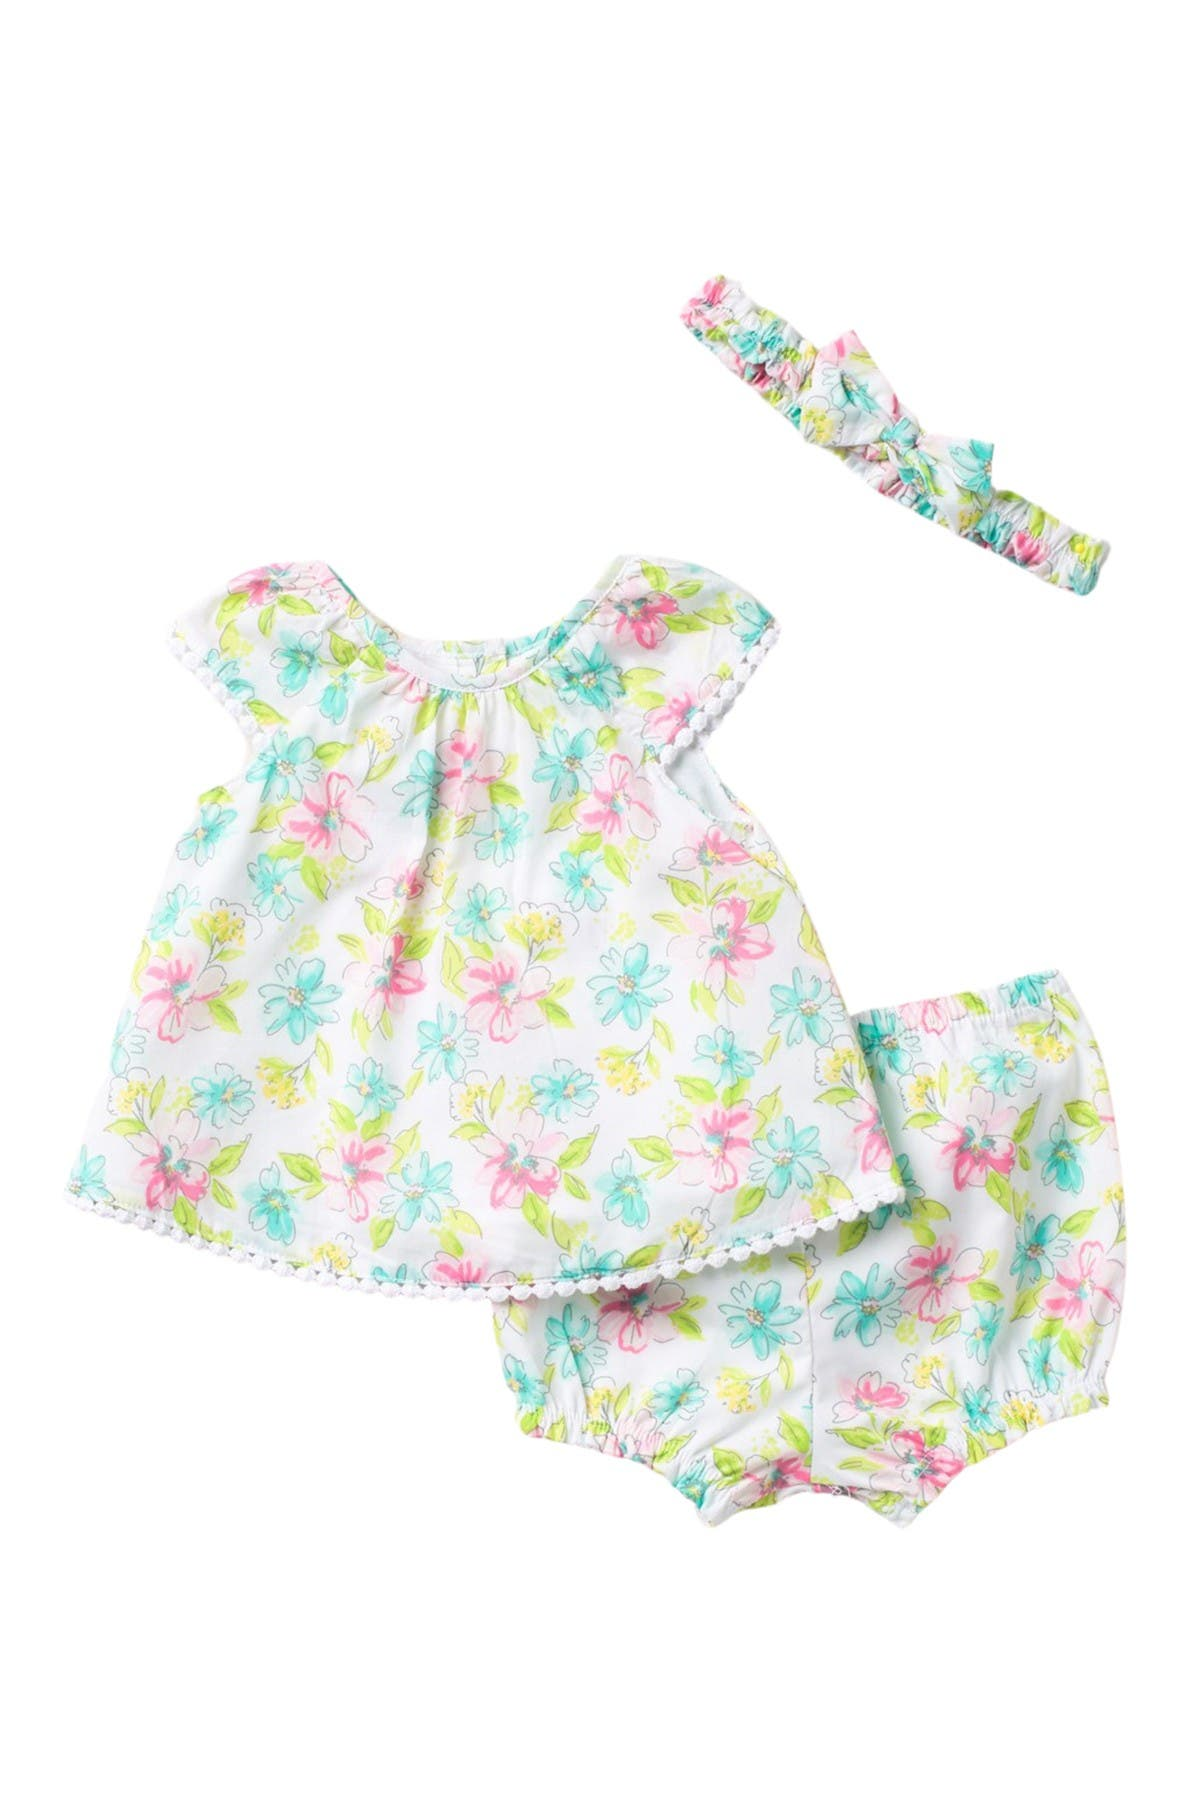 Image of Little Me Blossom Sunsuit & Headband Set